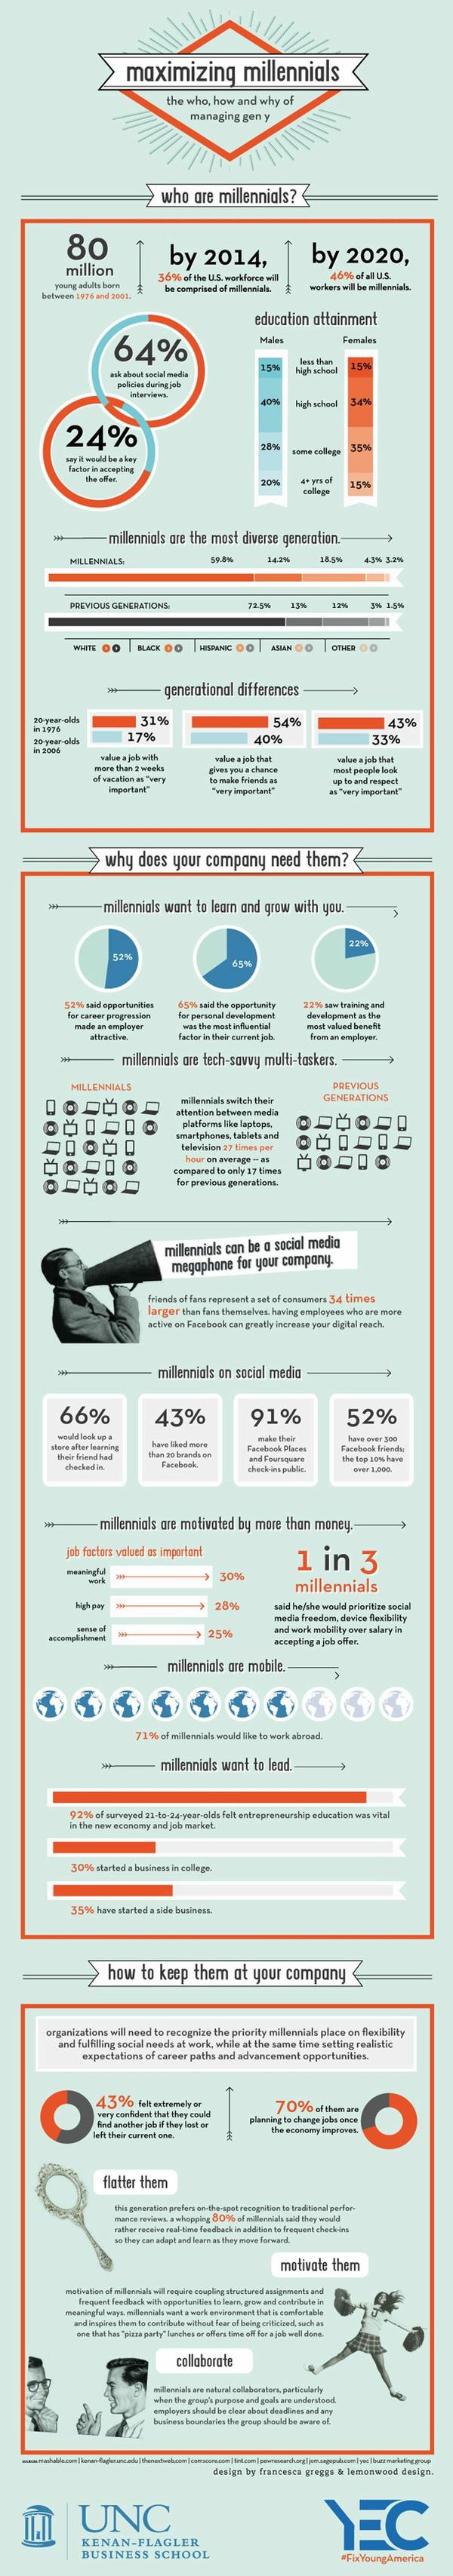 Millennials-jobs-social-media-9721